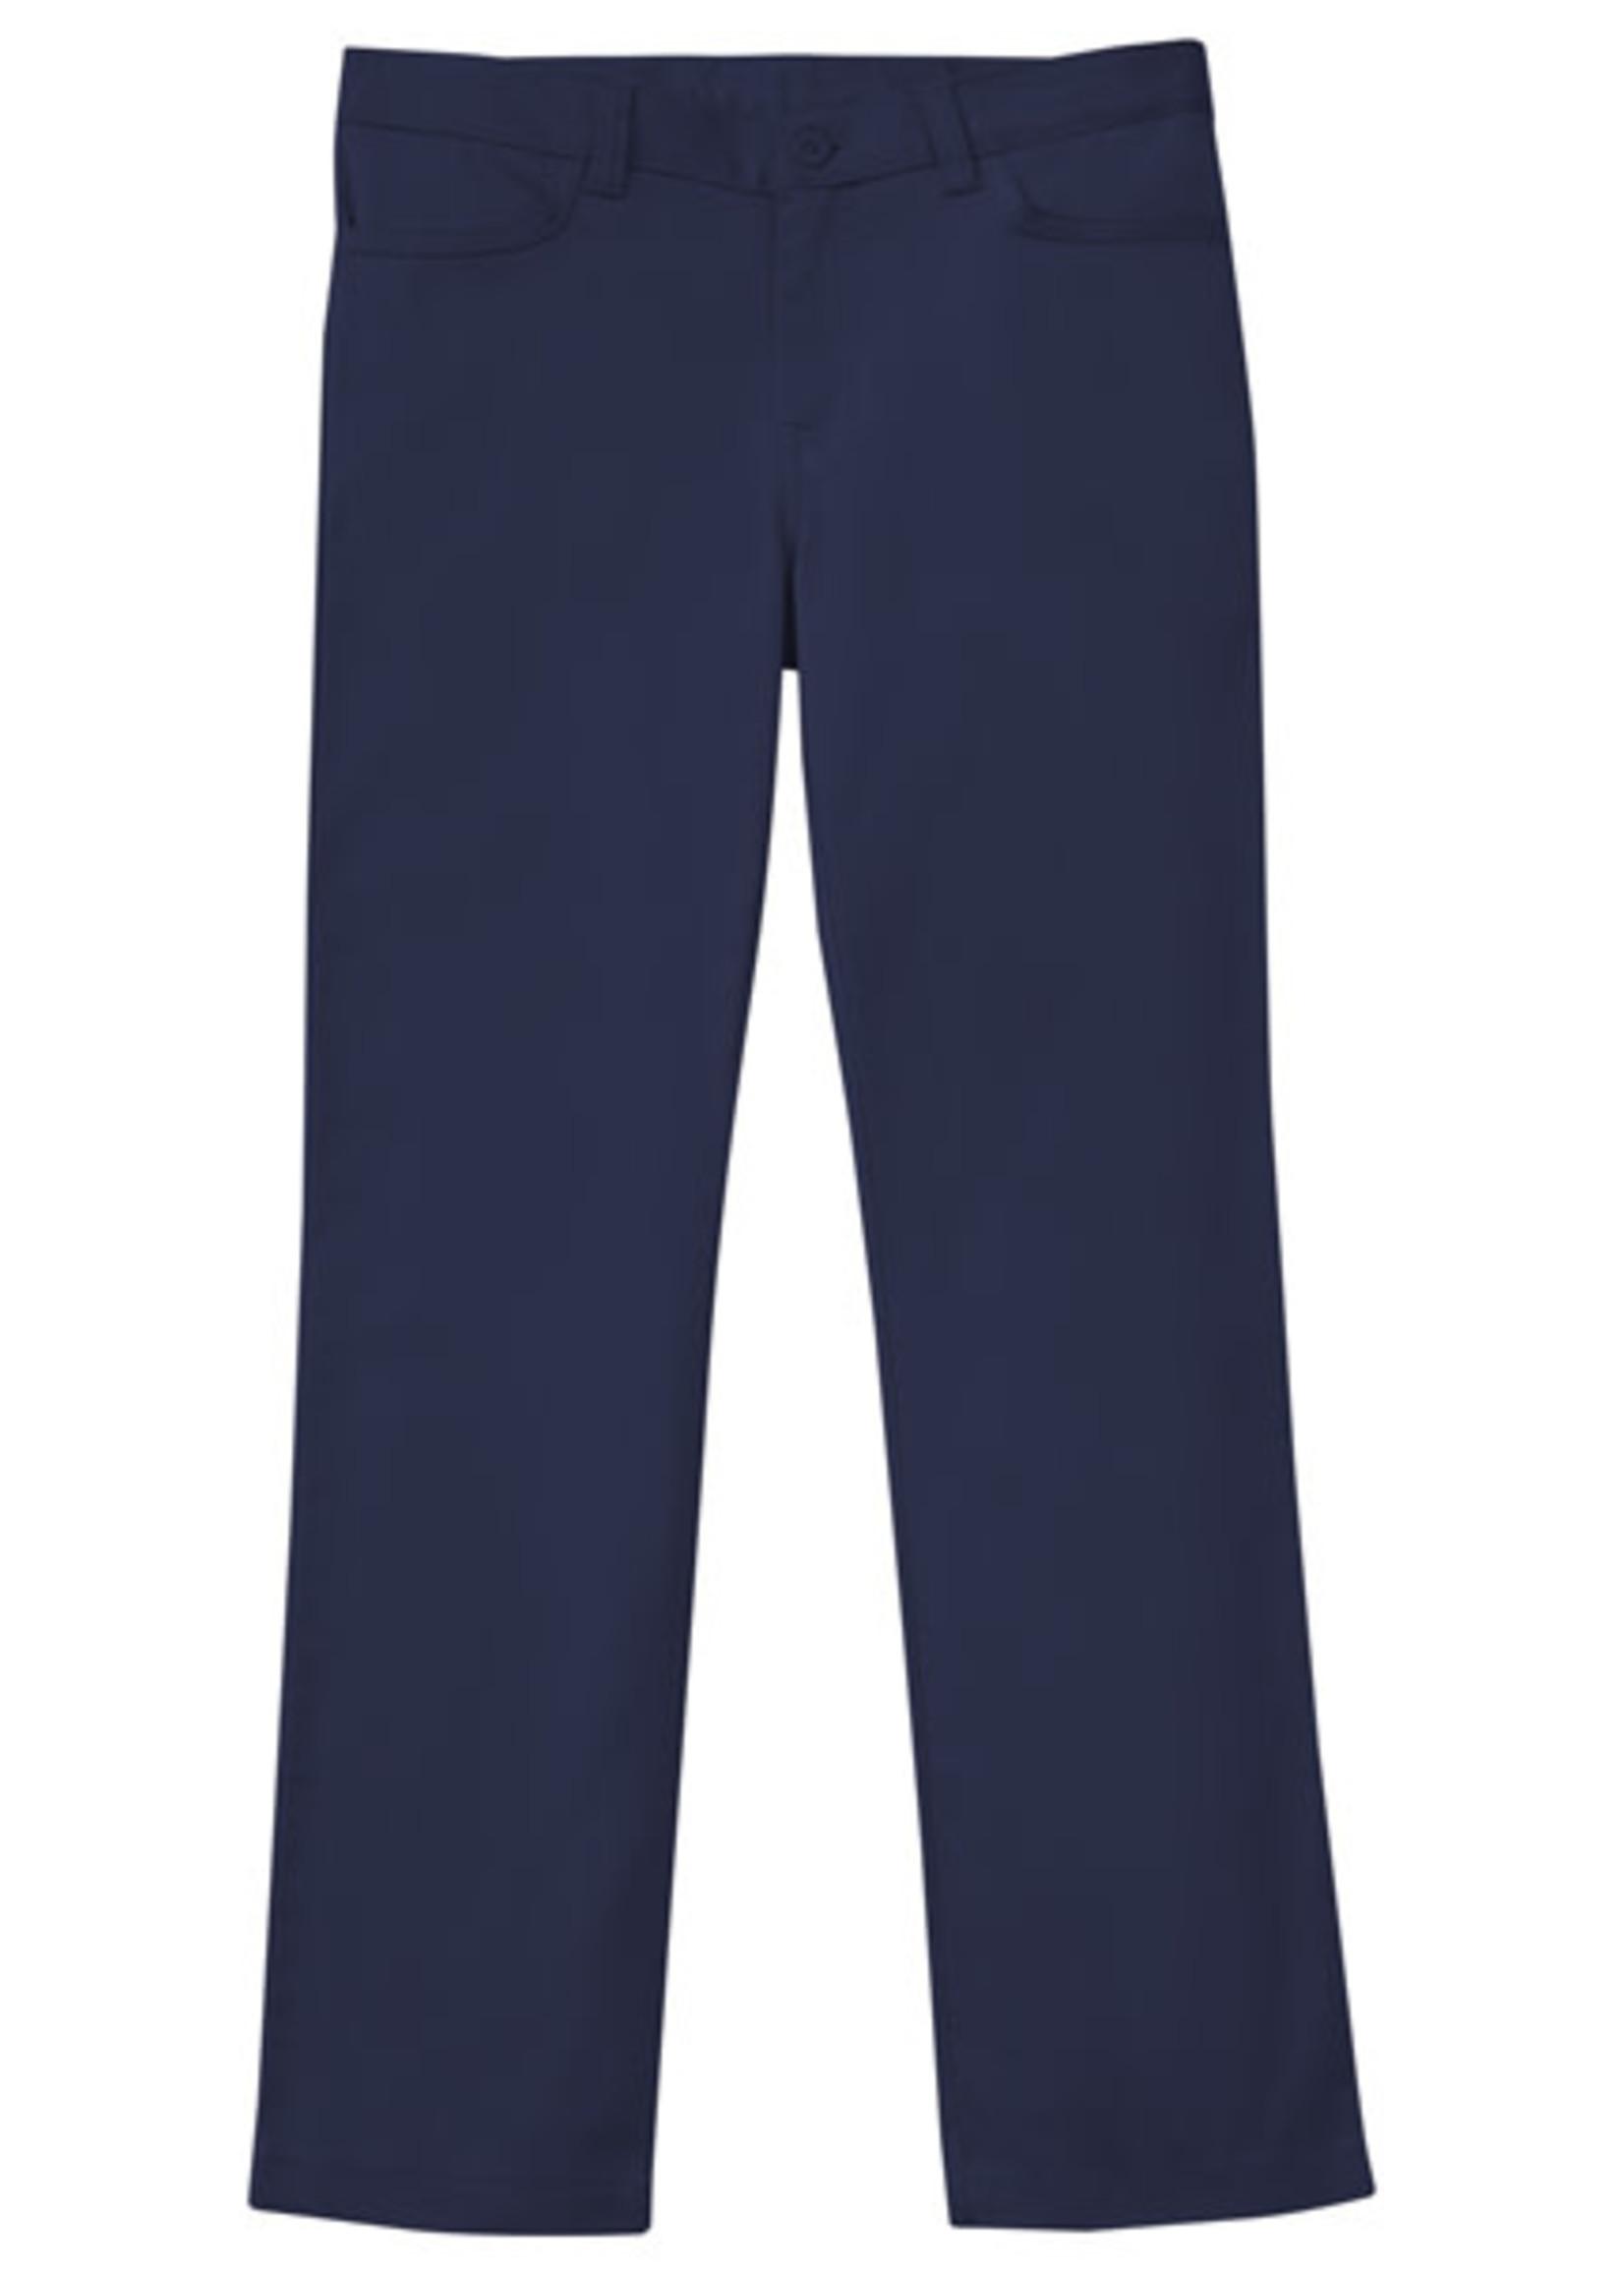 TUS Girls Navy Value Matchstick Pants